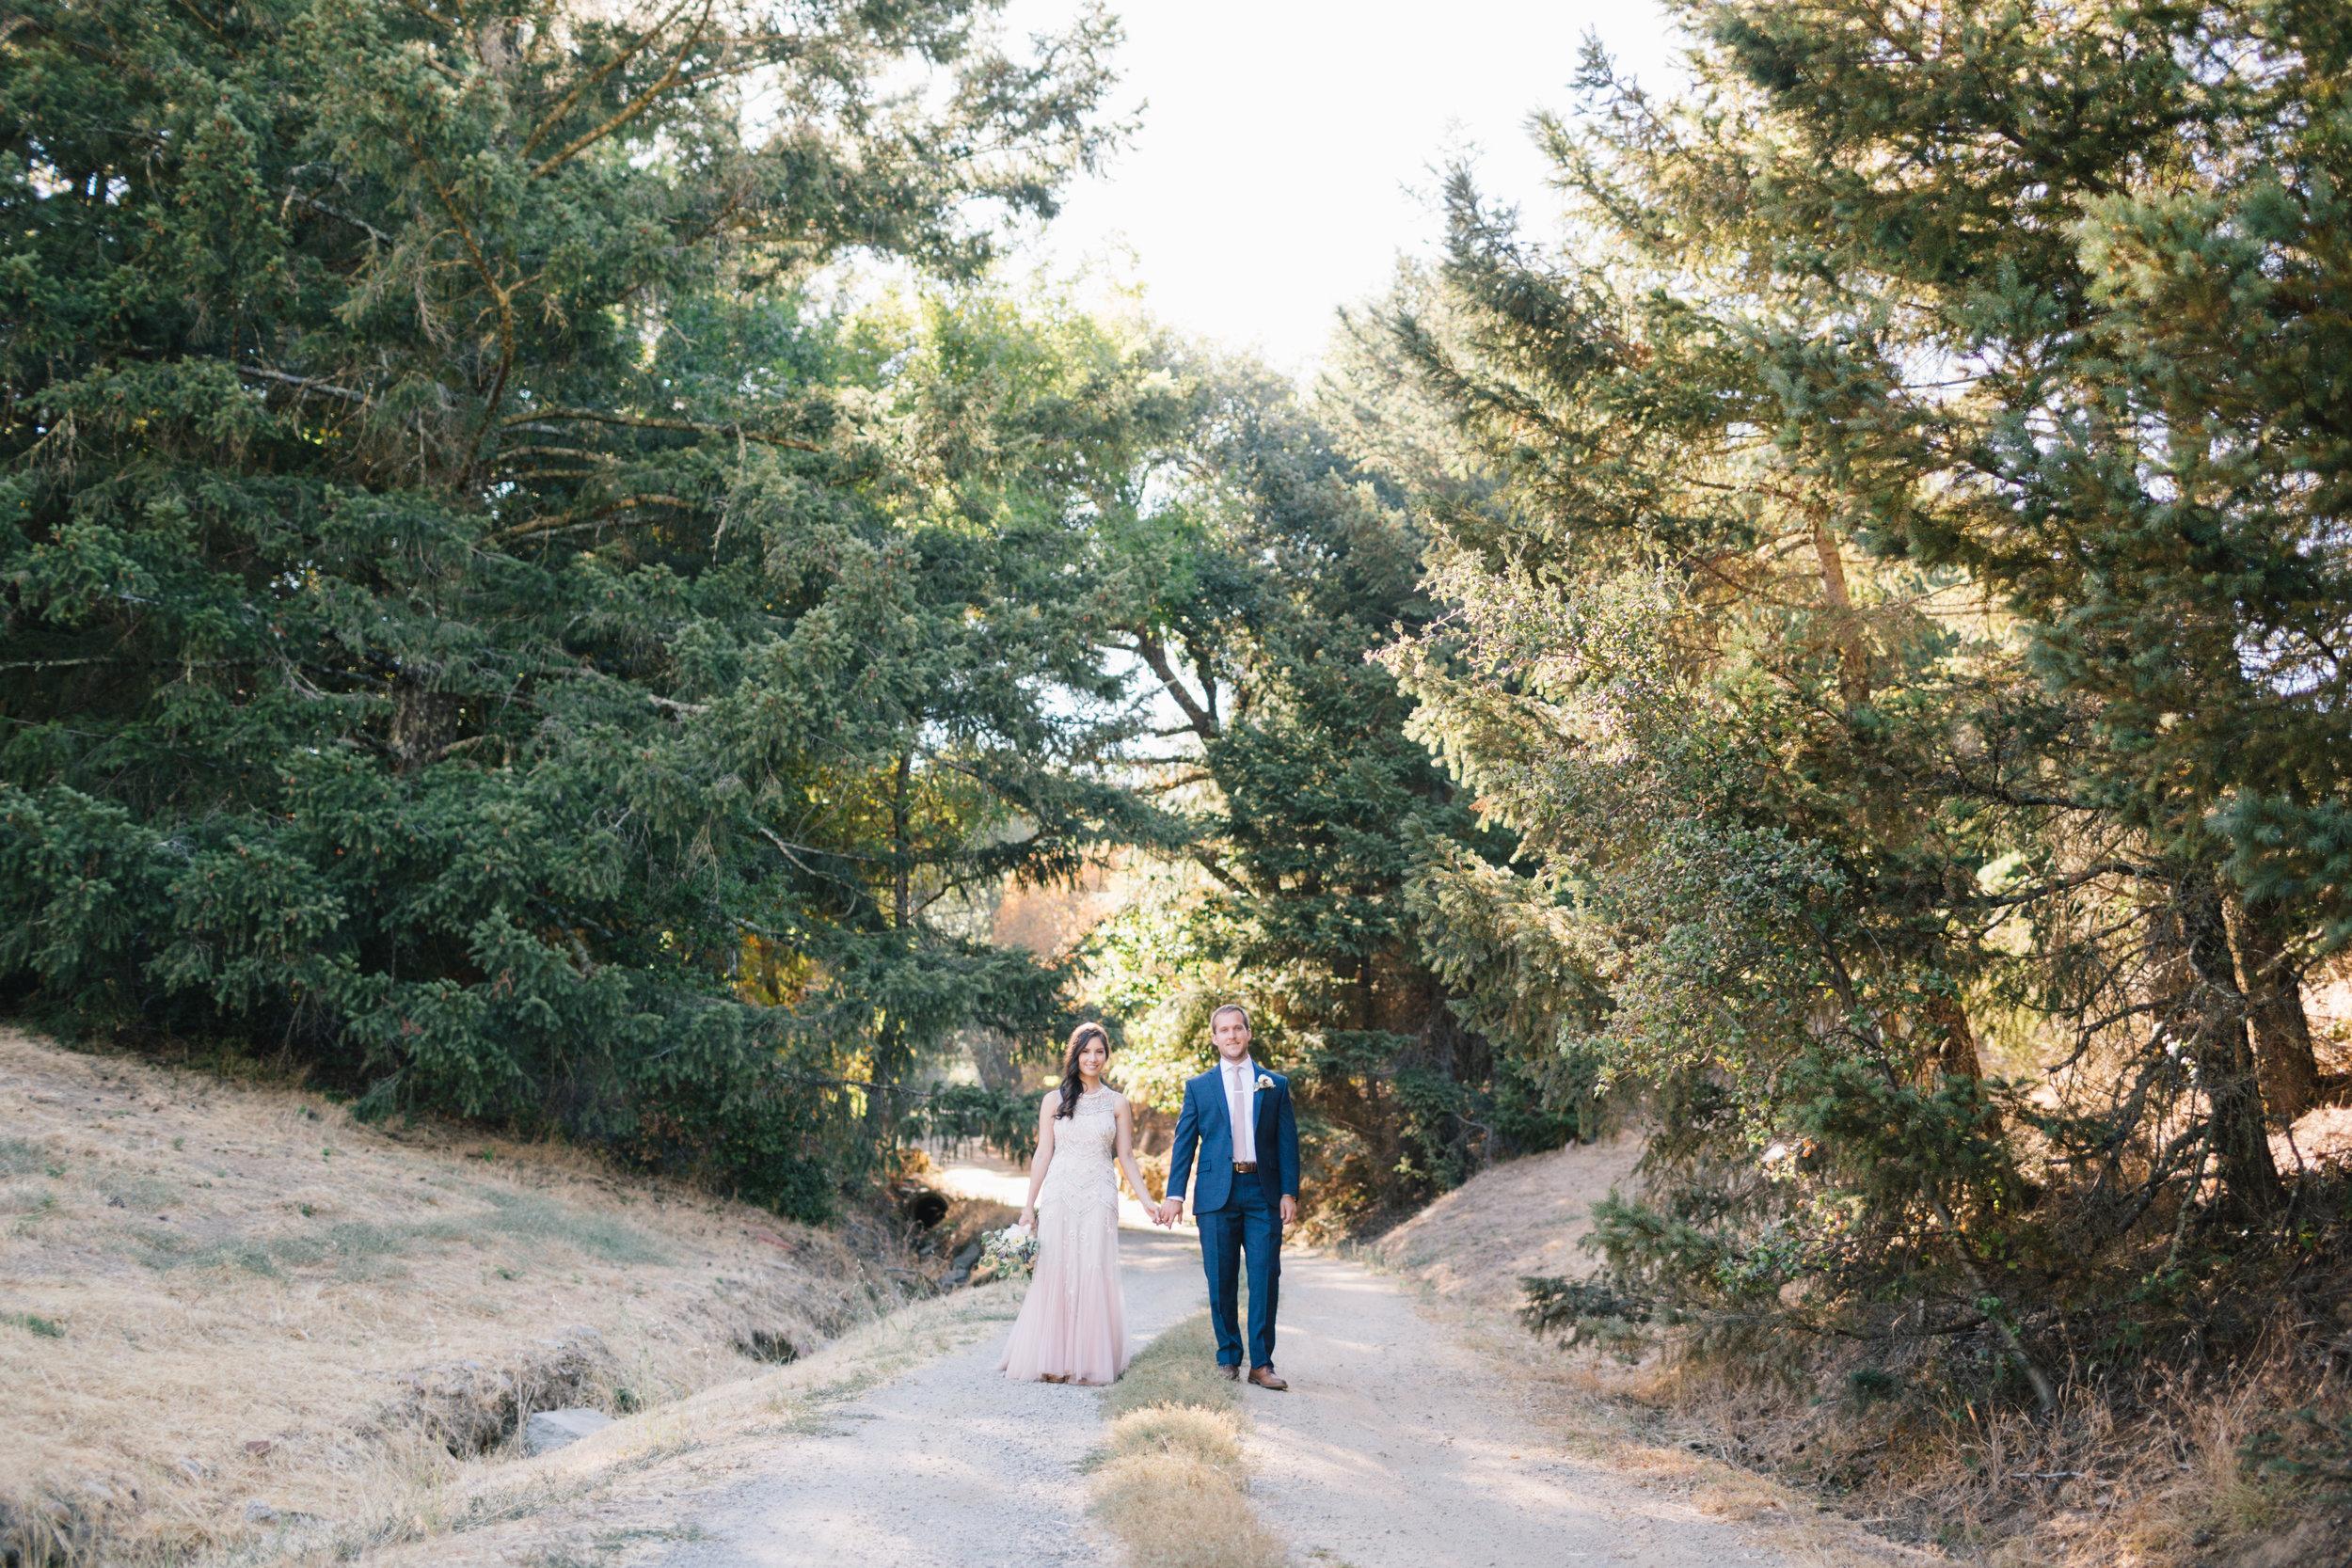 LishaWangPhotography_Carly_Matt_Wedding-504.jpg